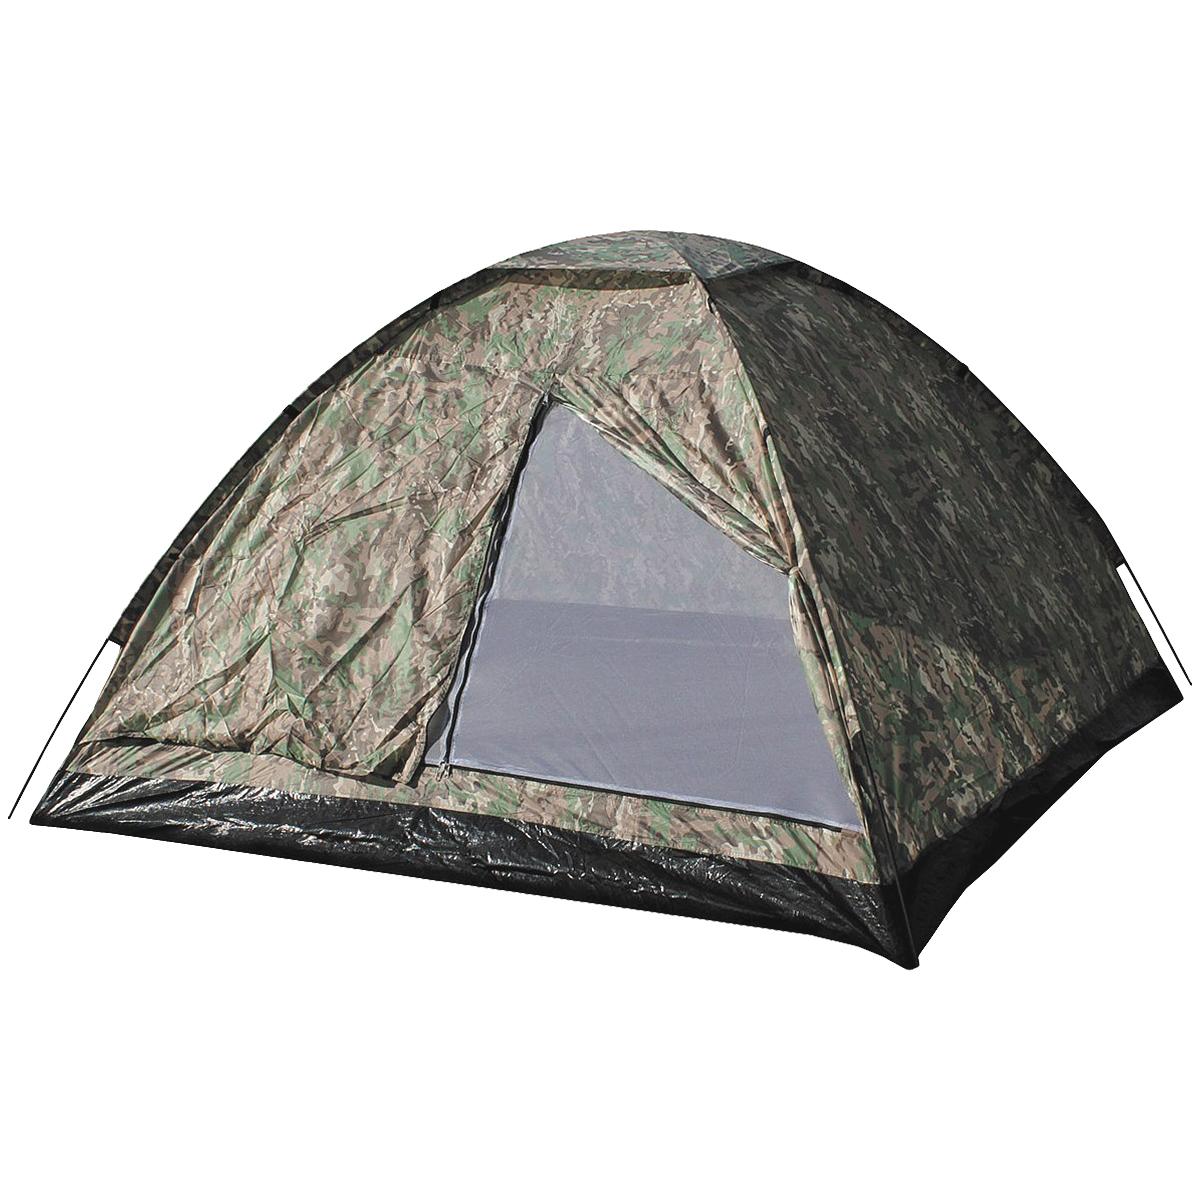 MFH 3 Person Tent Monodom with Mosquito Net Operation Camo ...  sc 1 st  Military 1st & Camping u0026 Festival Tents Highlander Tents Bivi Bag u0026 Bashas UK ...